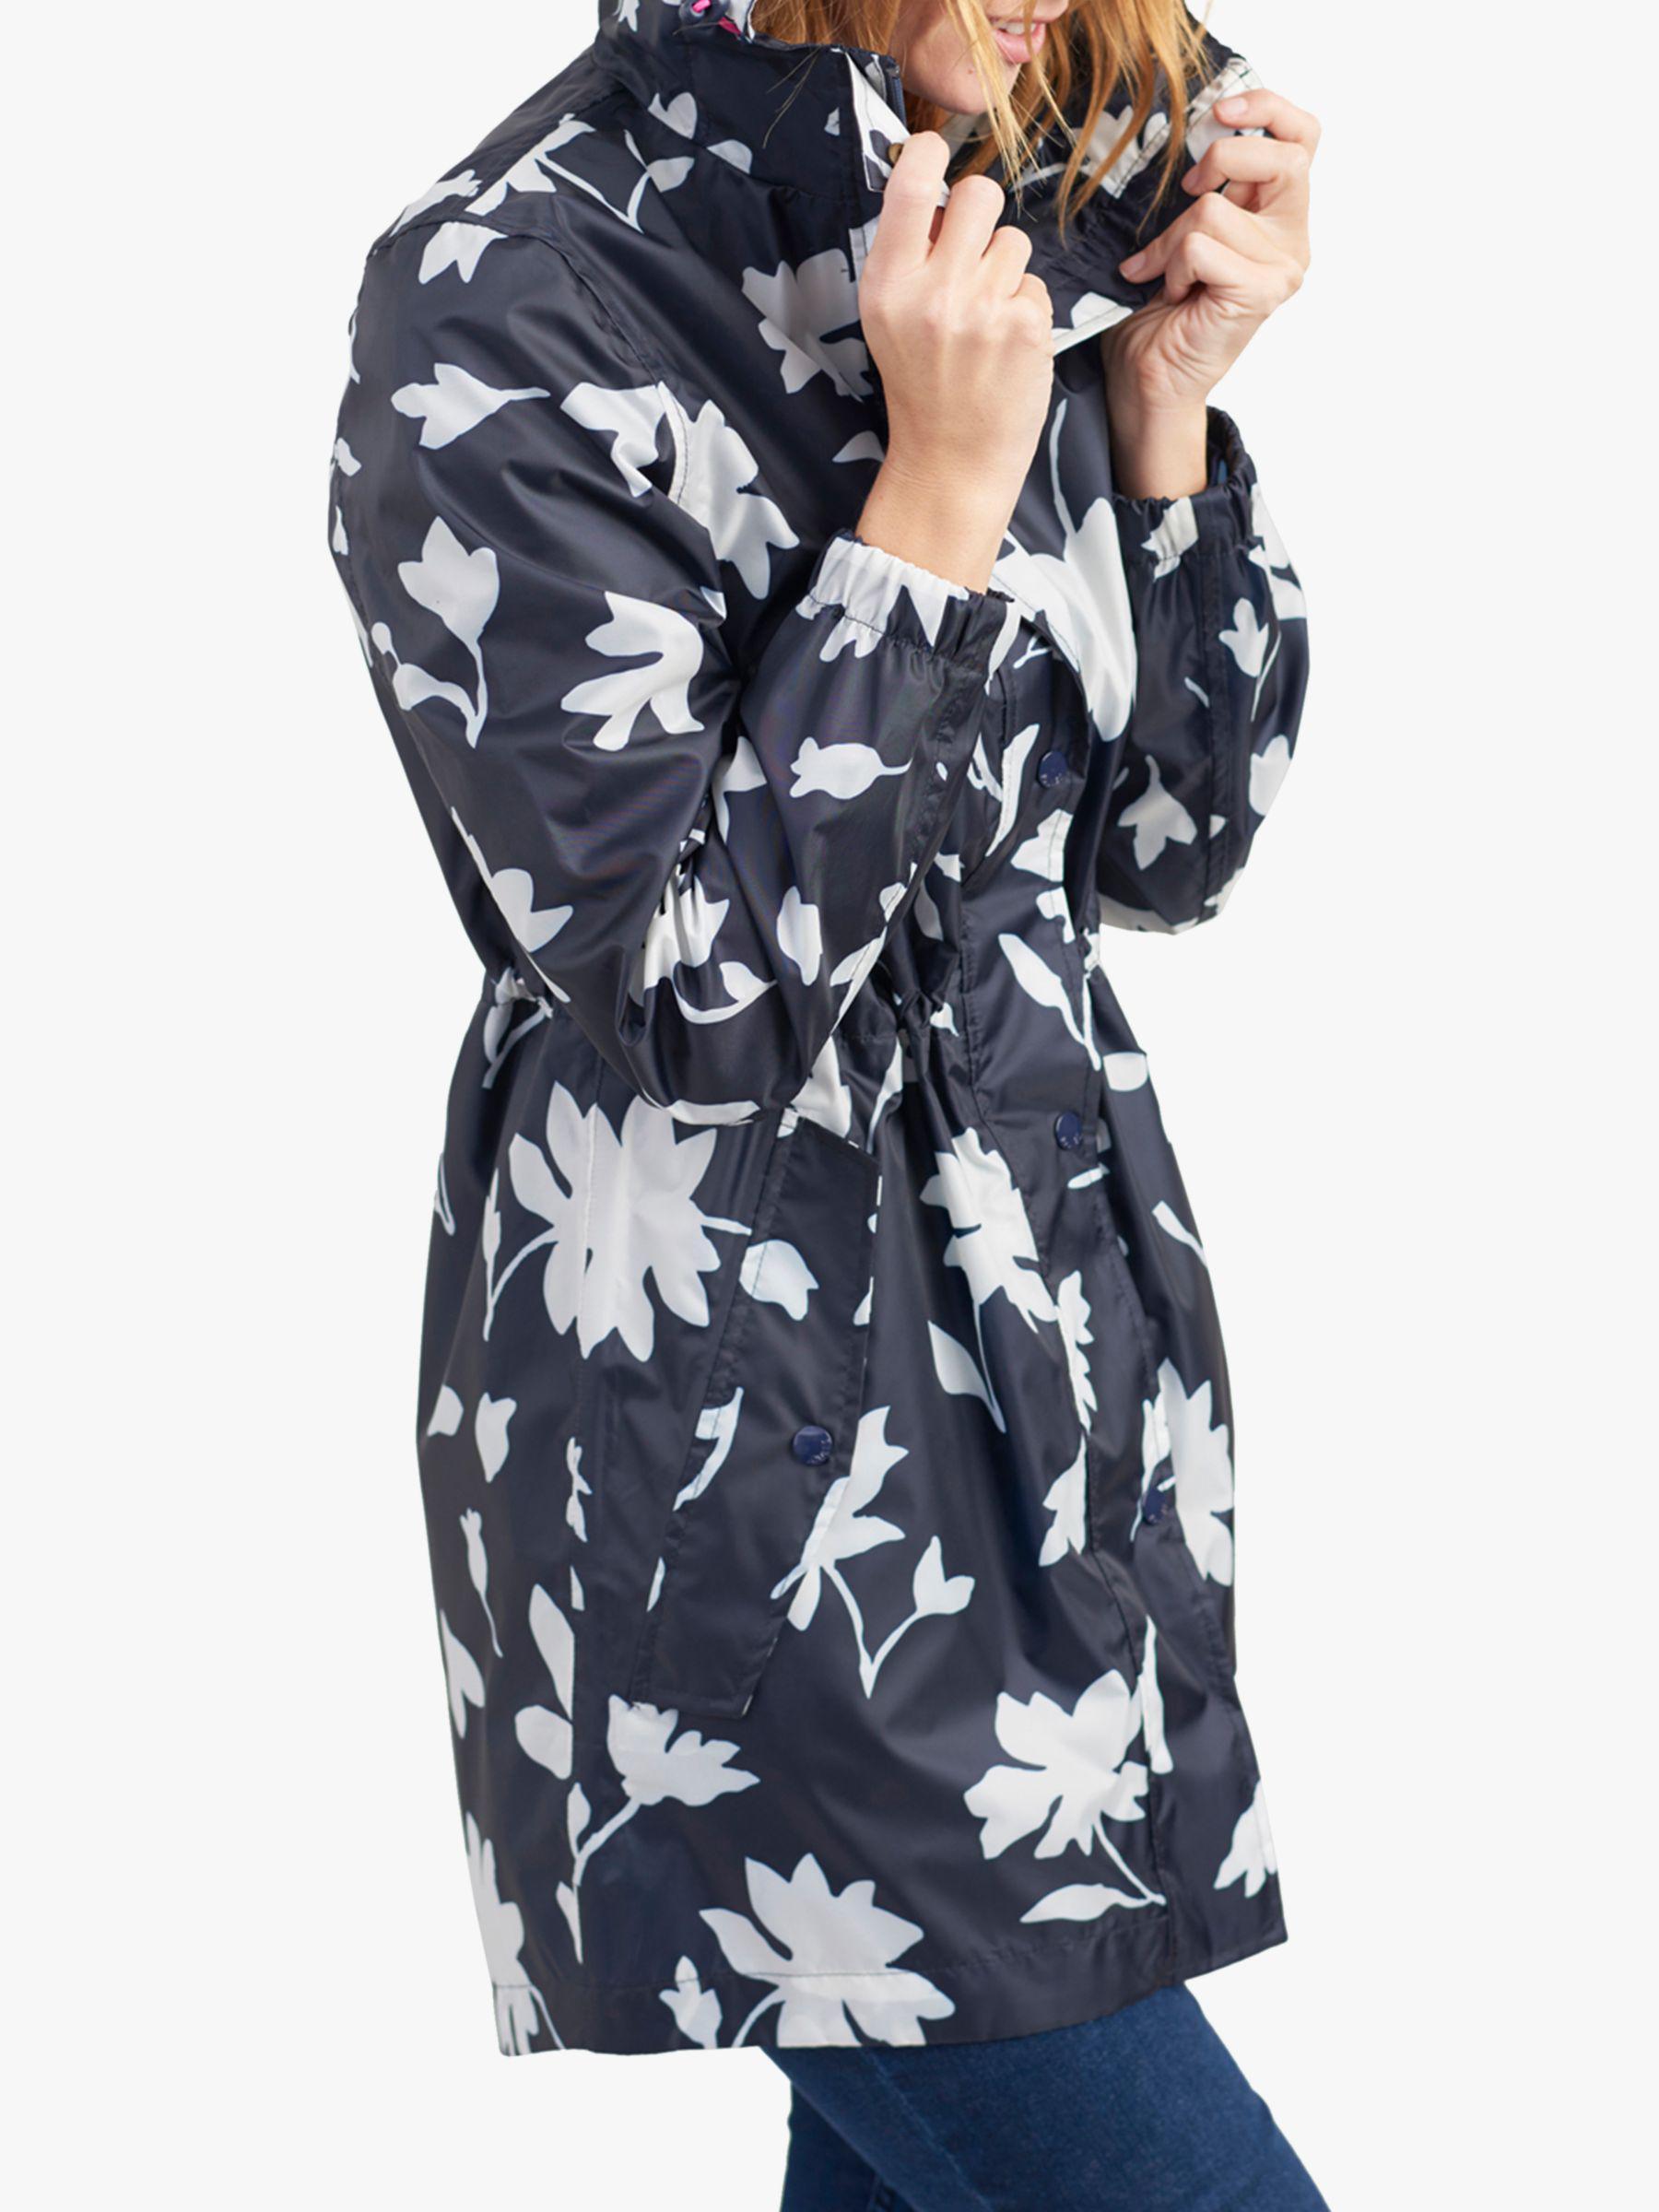 639401ffeb55 Joules. Women s Blue Golightly Pack-away Waterproof Floral Print Parka Coat